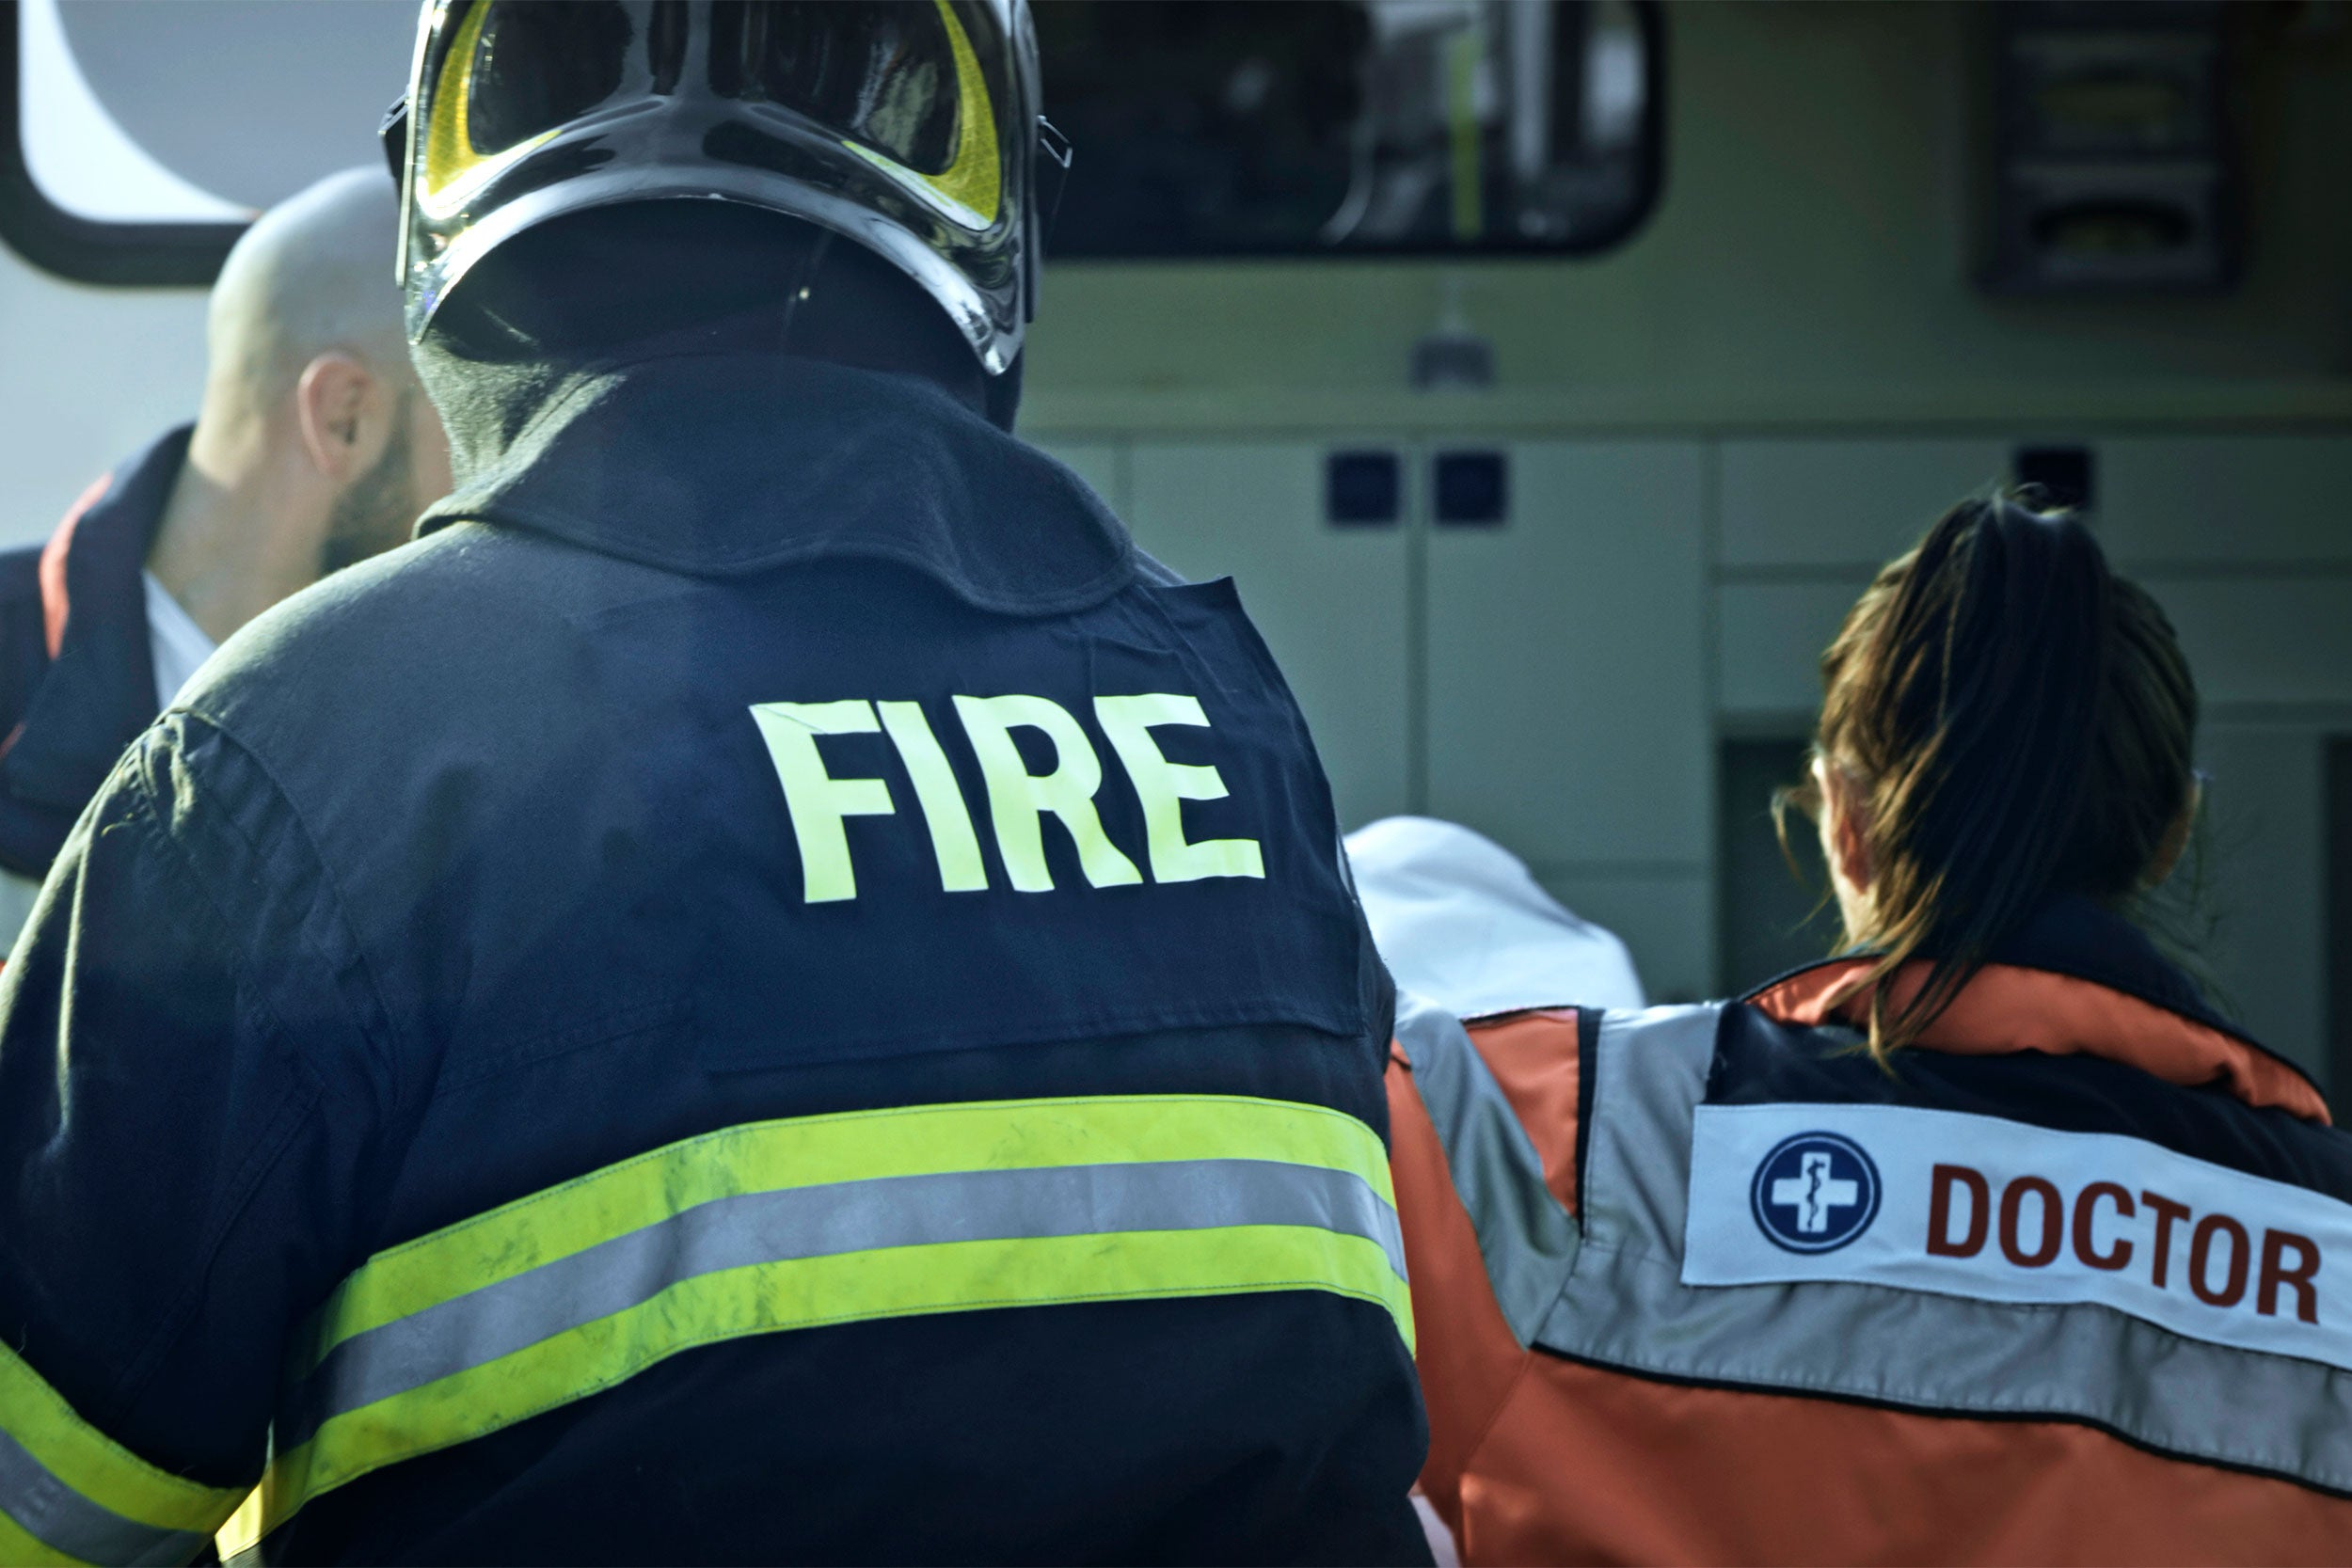 Fireman, EMT and doctor next to ambulance.